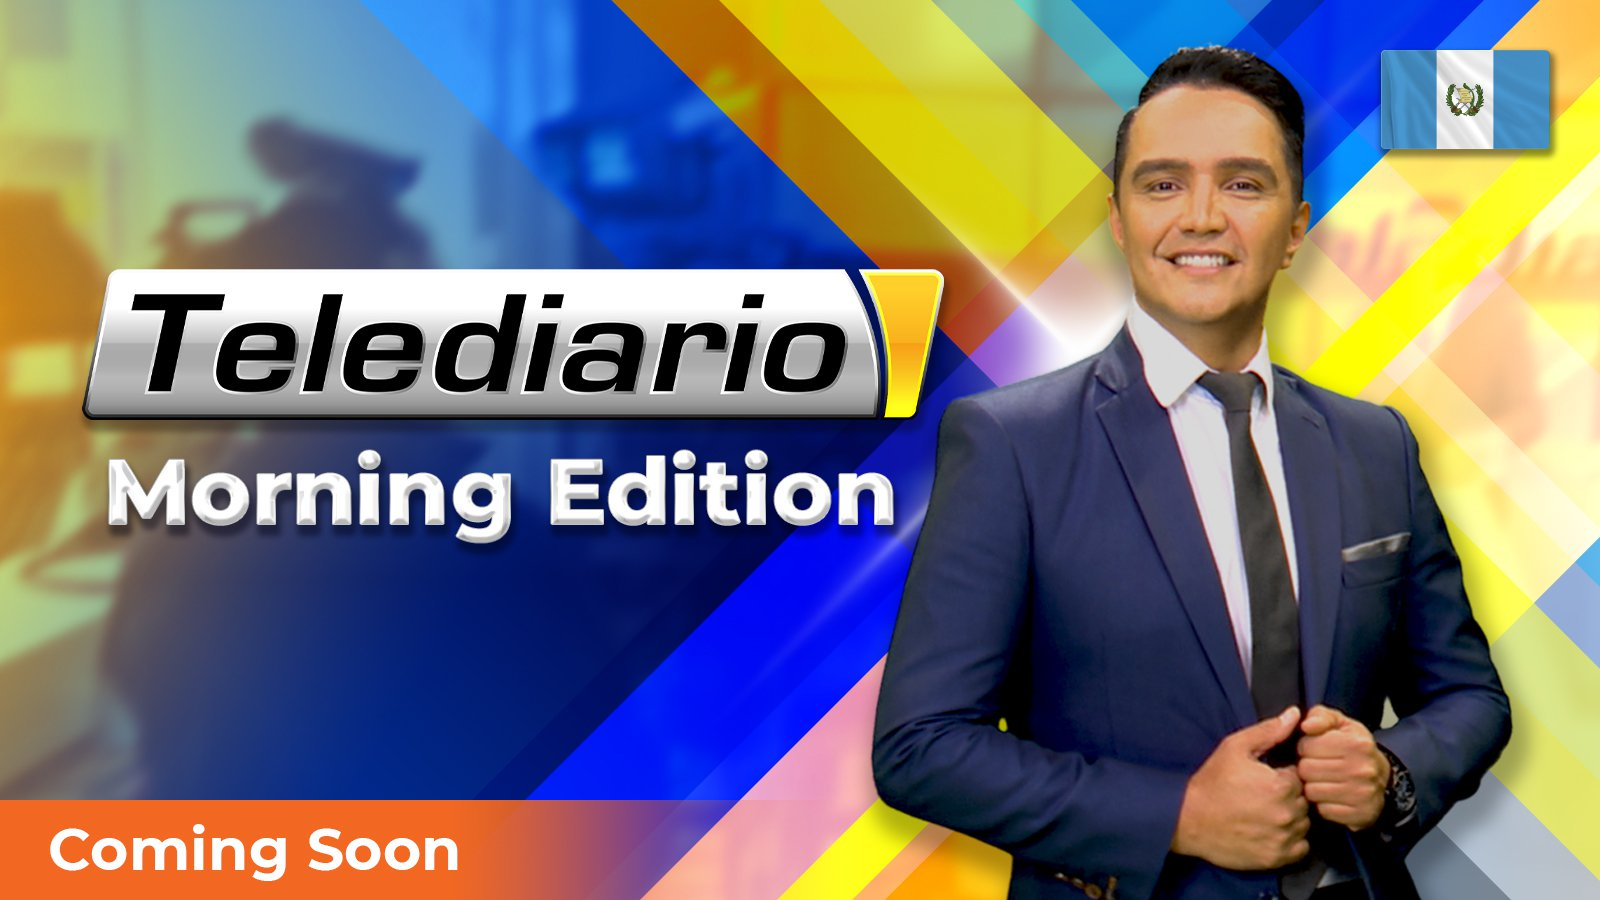 Telediario al Amanecer poster